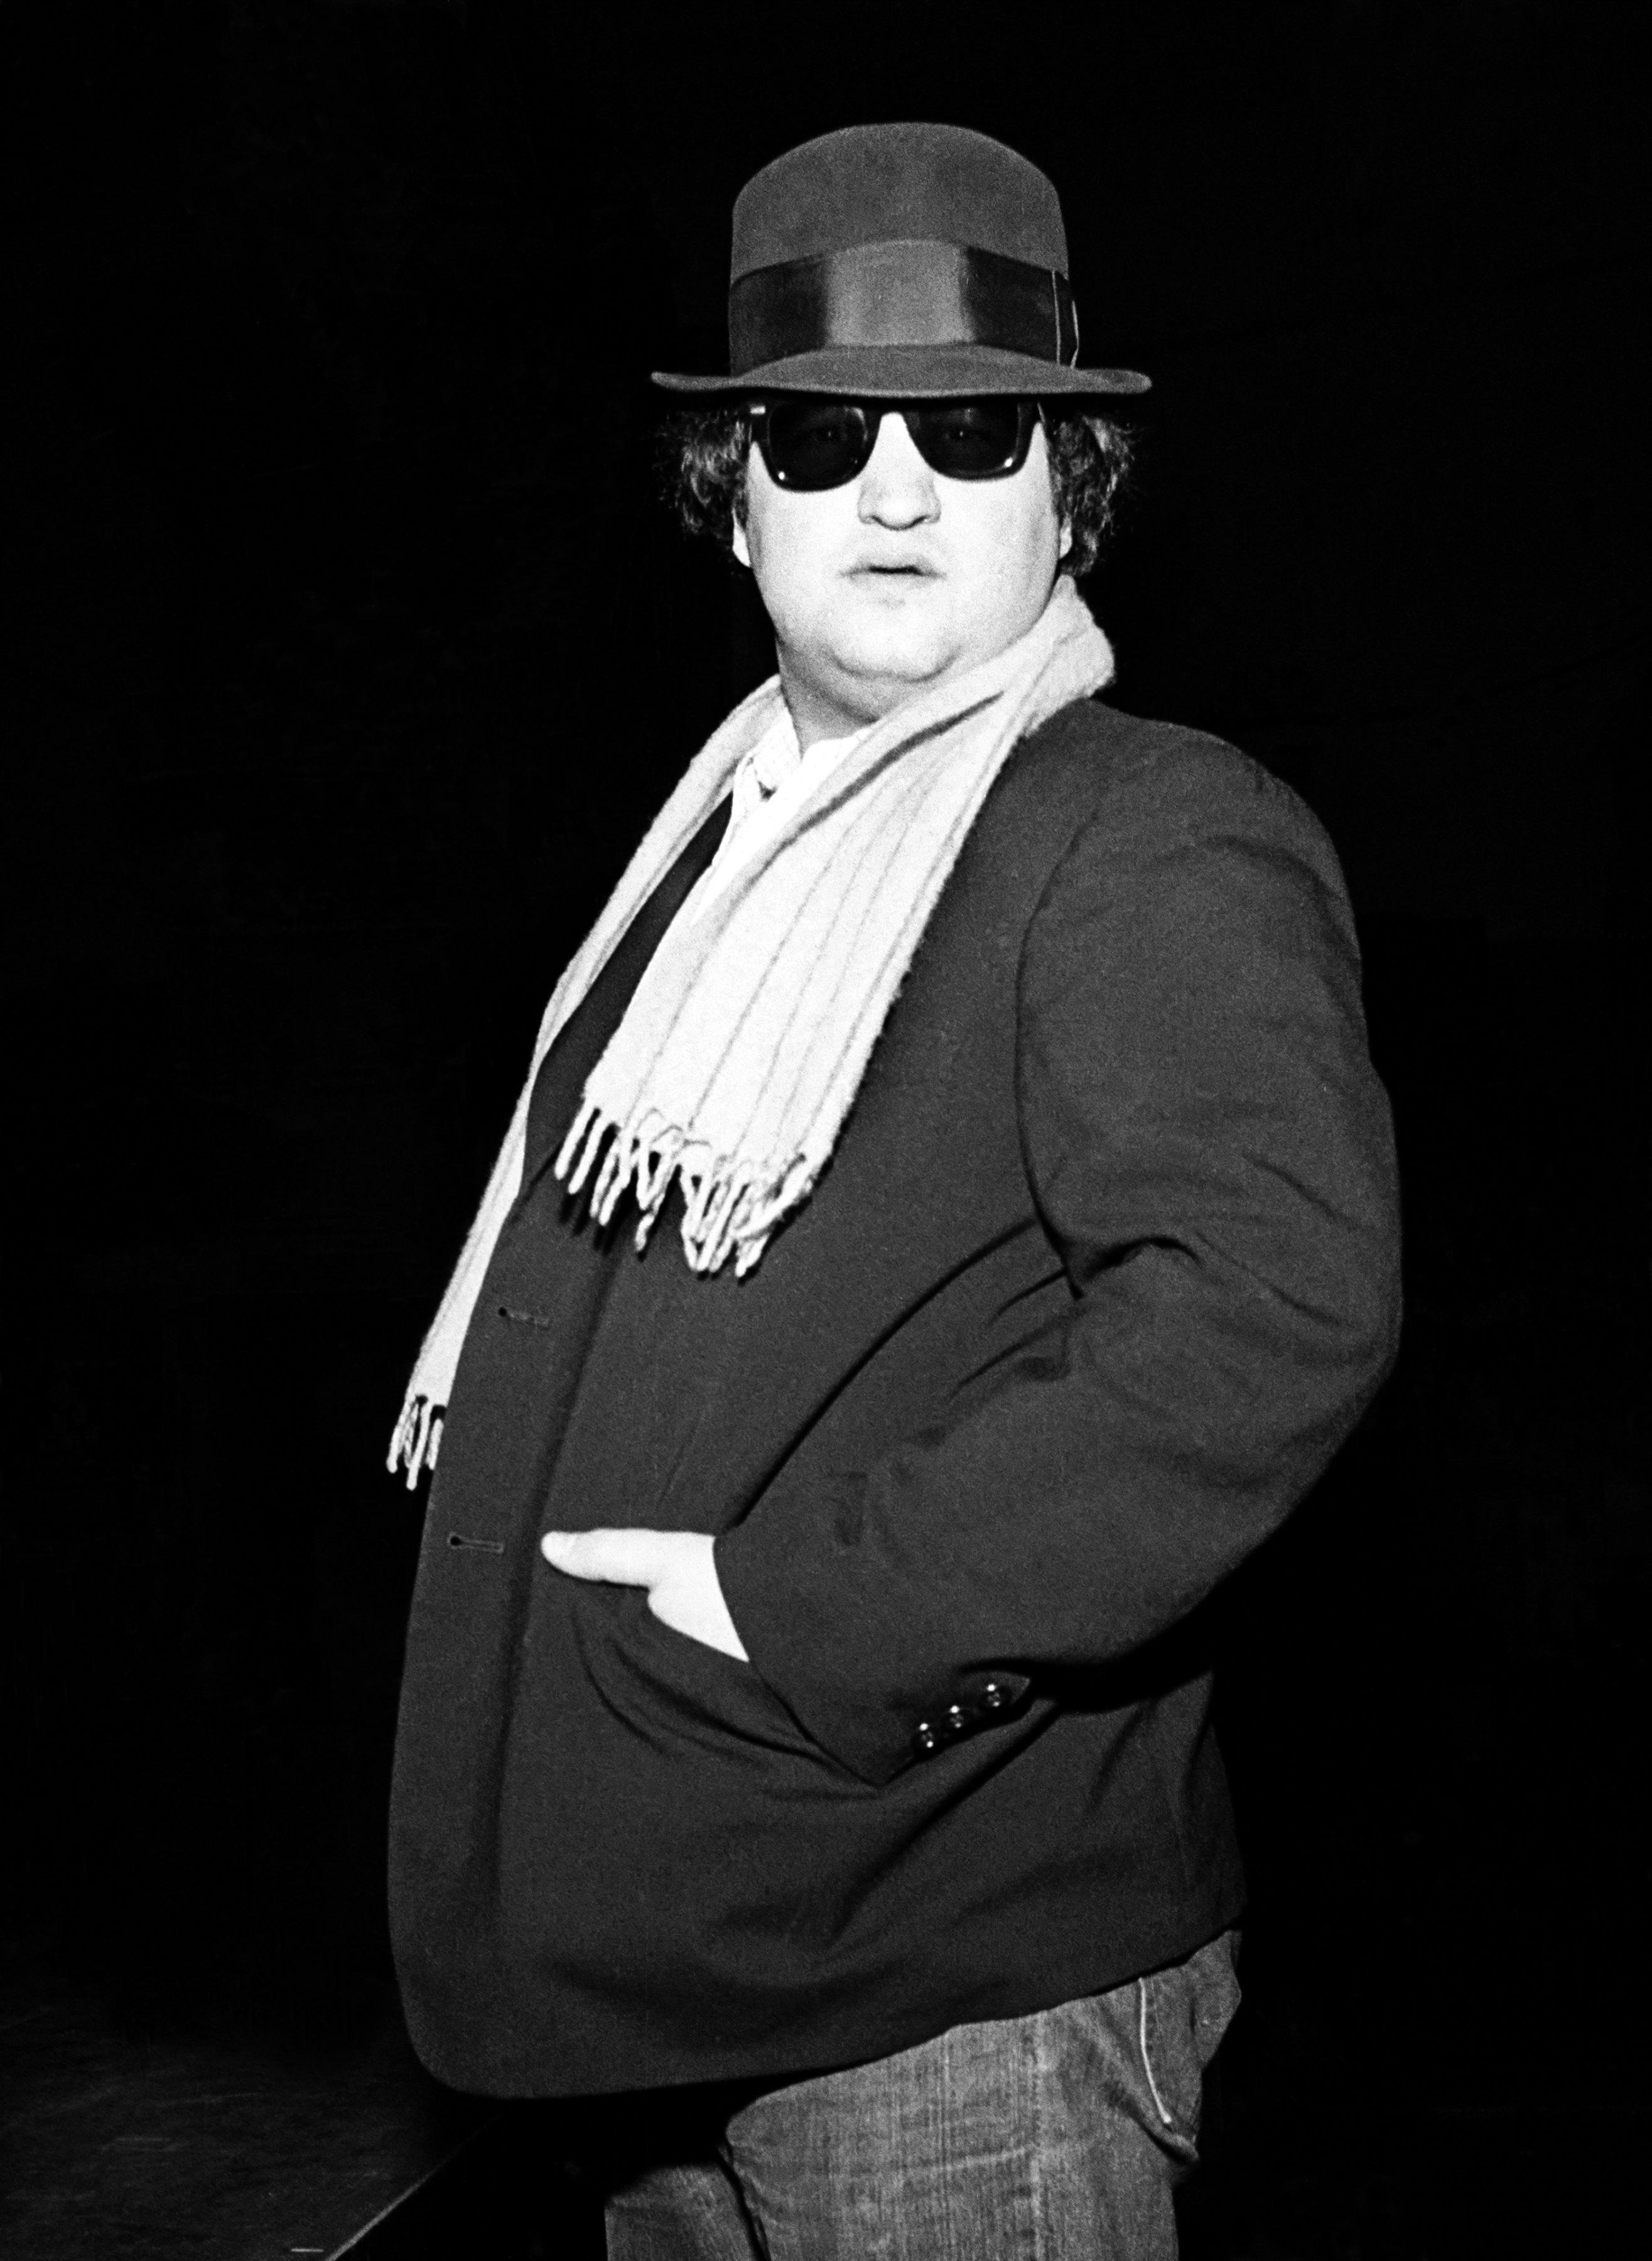 0896a1c828838 John Belushi. John Belushi poses during rehearsal for a Blues Brothers ...